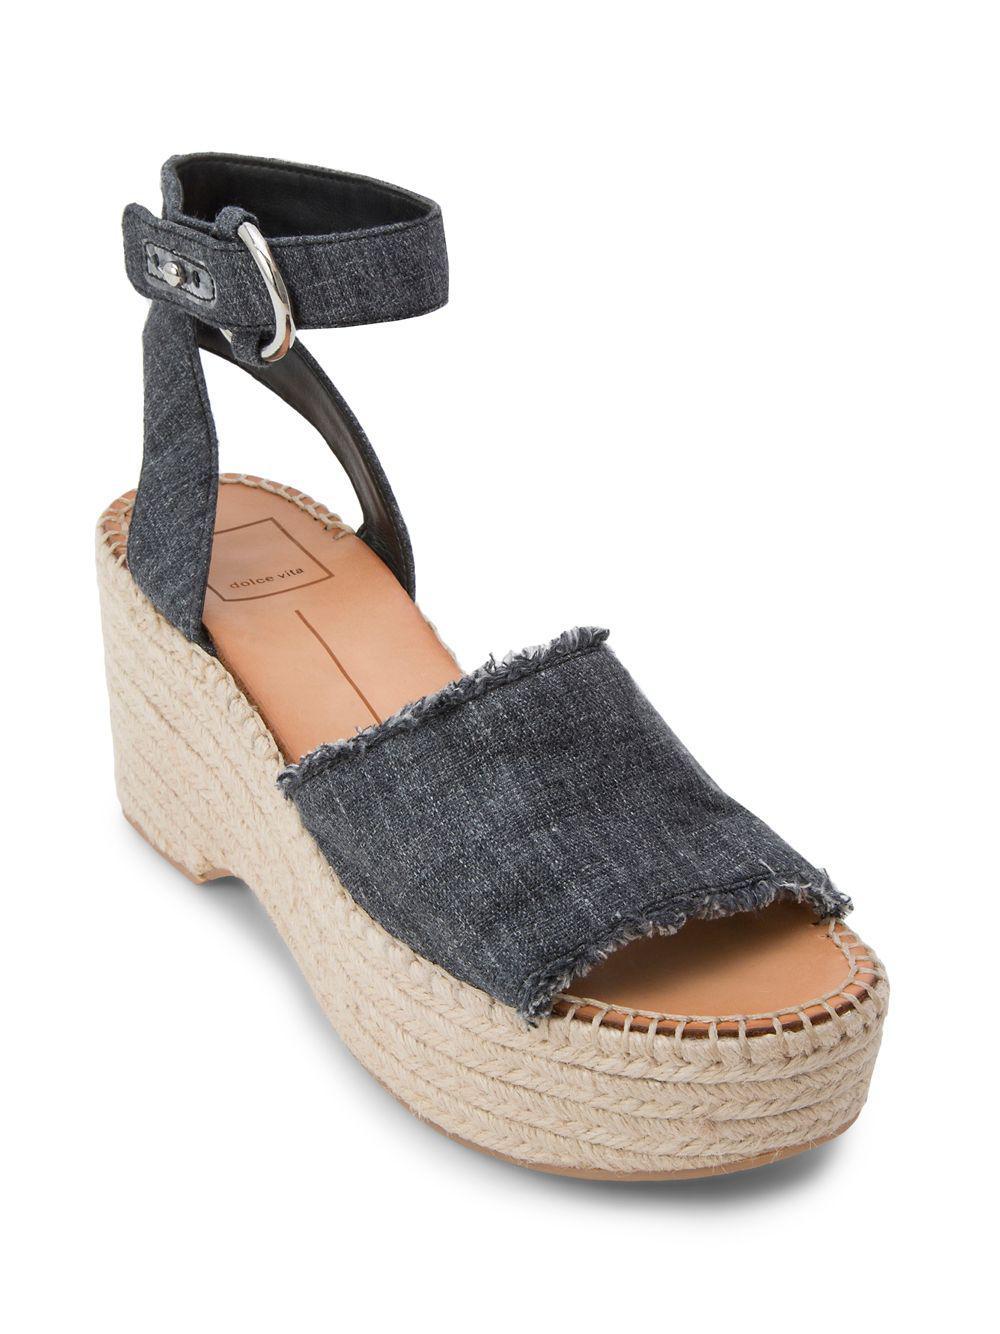 2157c31fac0 Dolce Vita - Blue Lesly Espadrille Sandals - Lyst